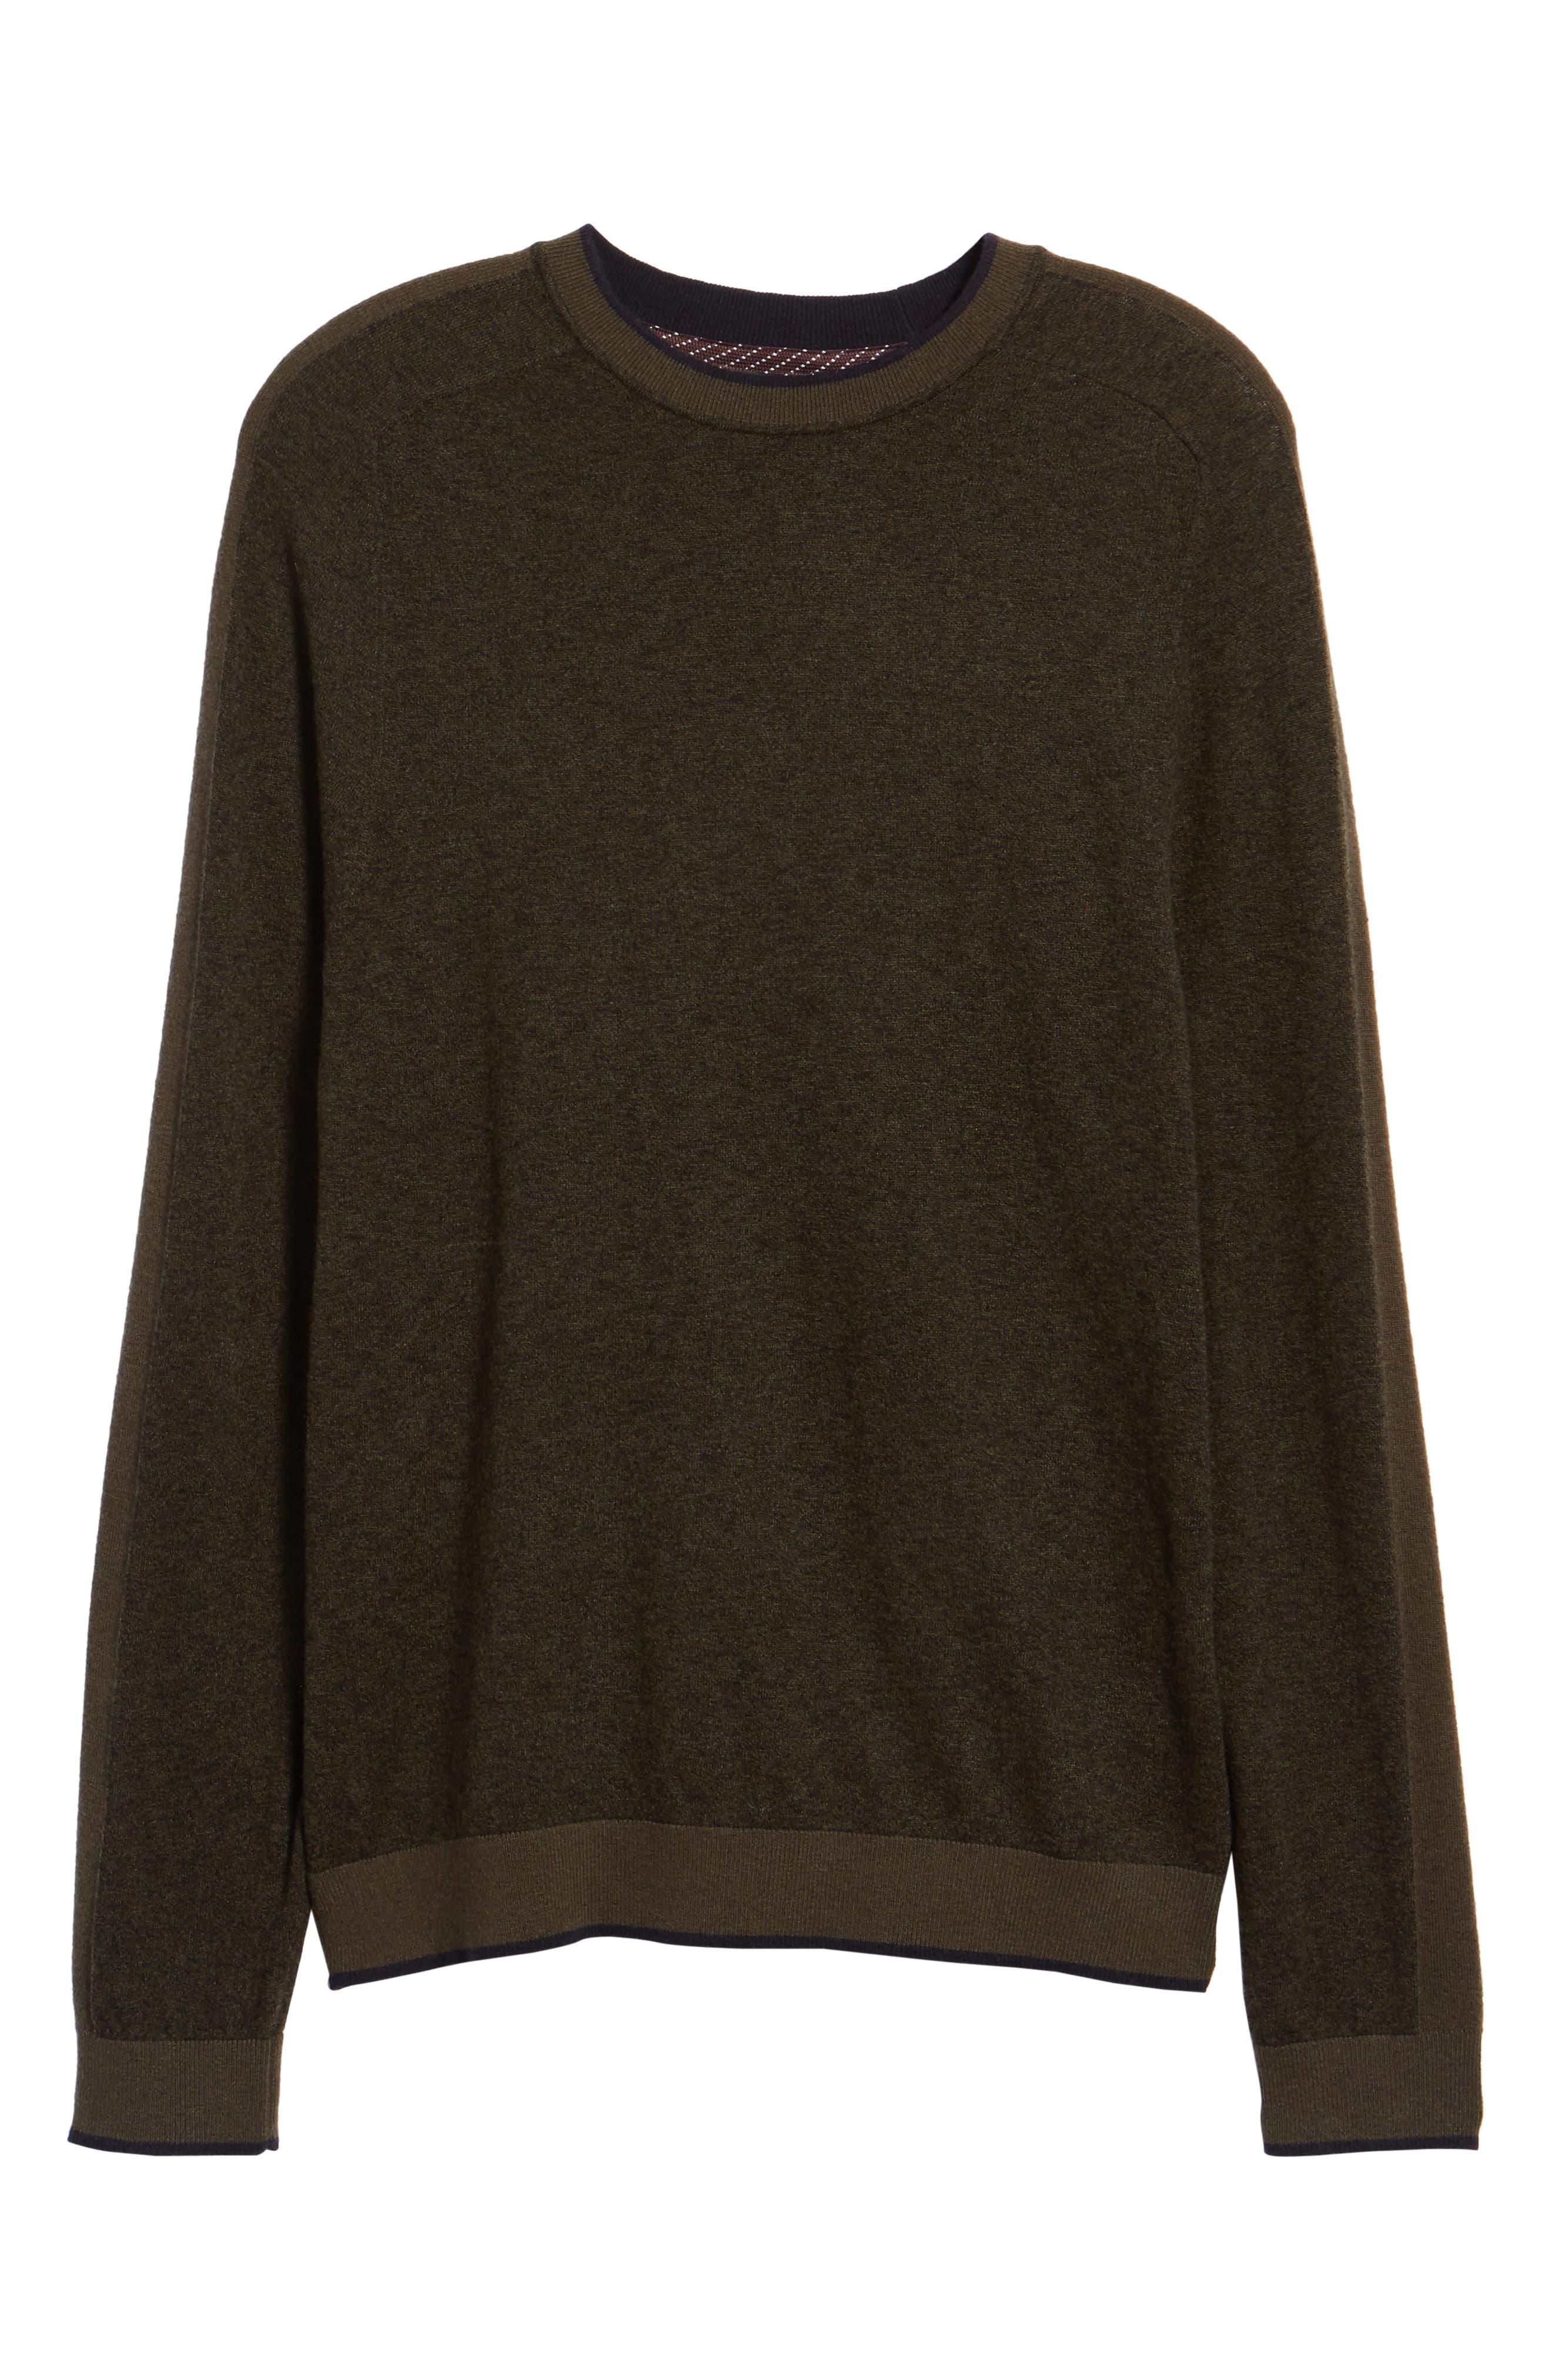 Norpol Crewneck Sweater,                             Alternate thumbnail 22, color,